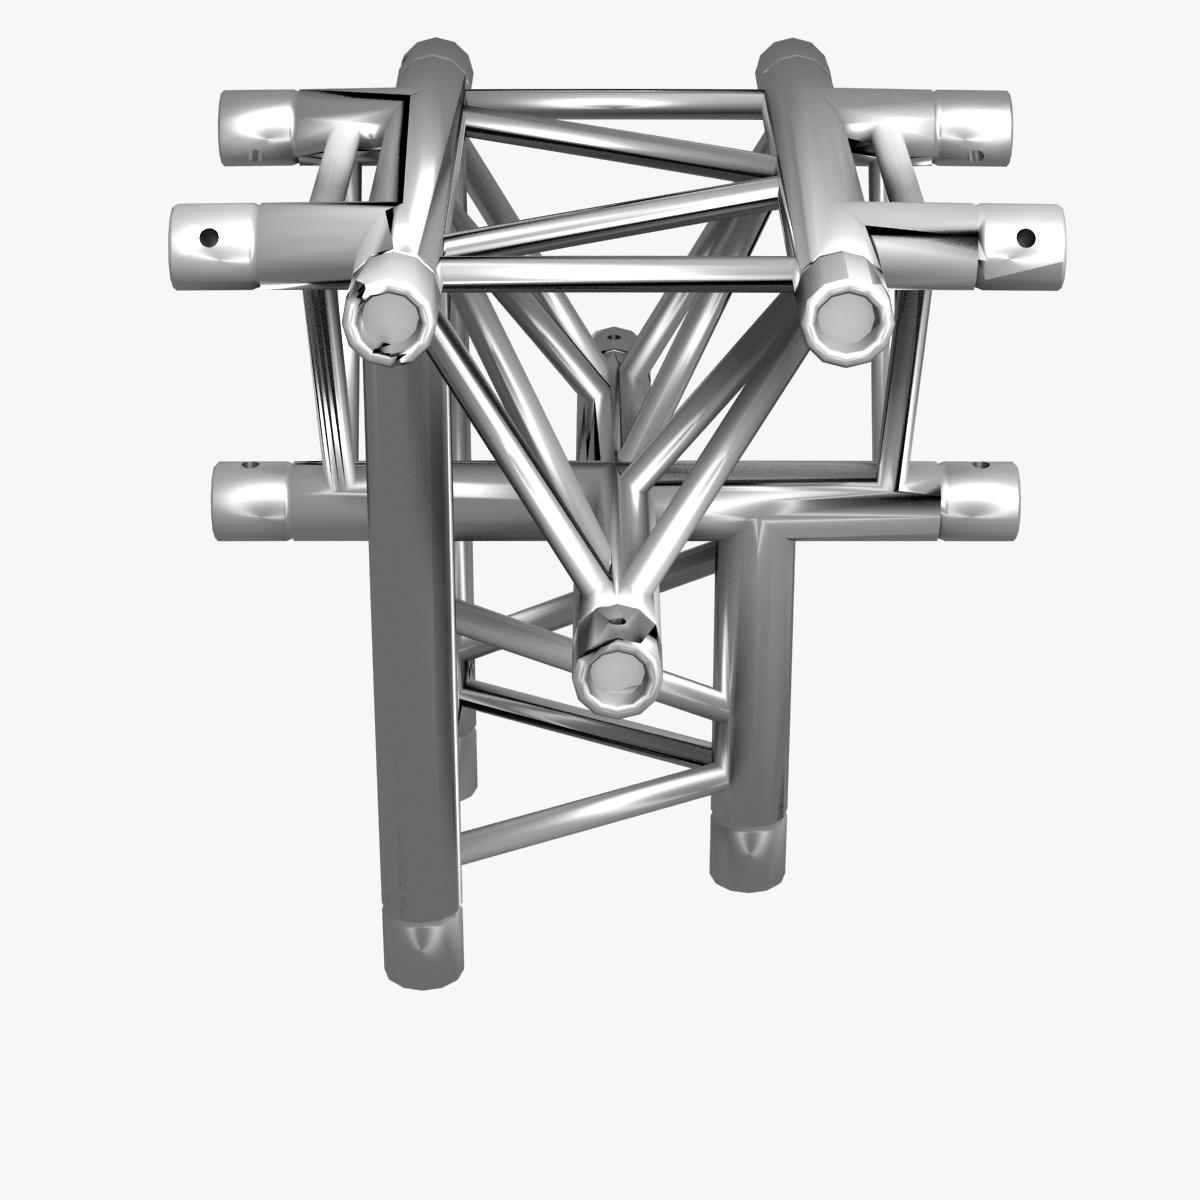 triangular trusses (collection 55 modular pieces) 3d model 3ds max dxf fbx c4d dae texture obj 216229